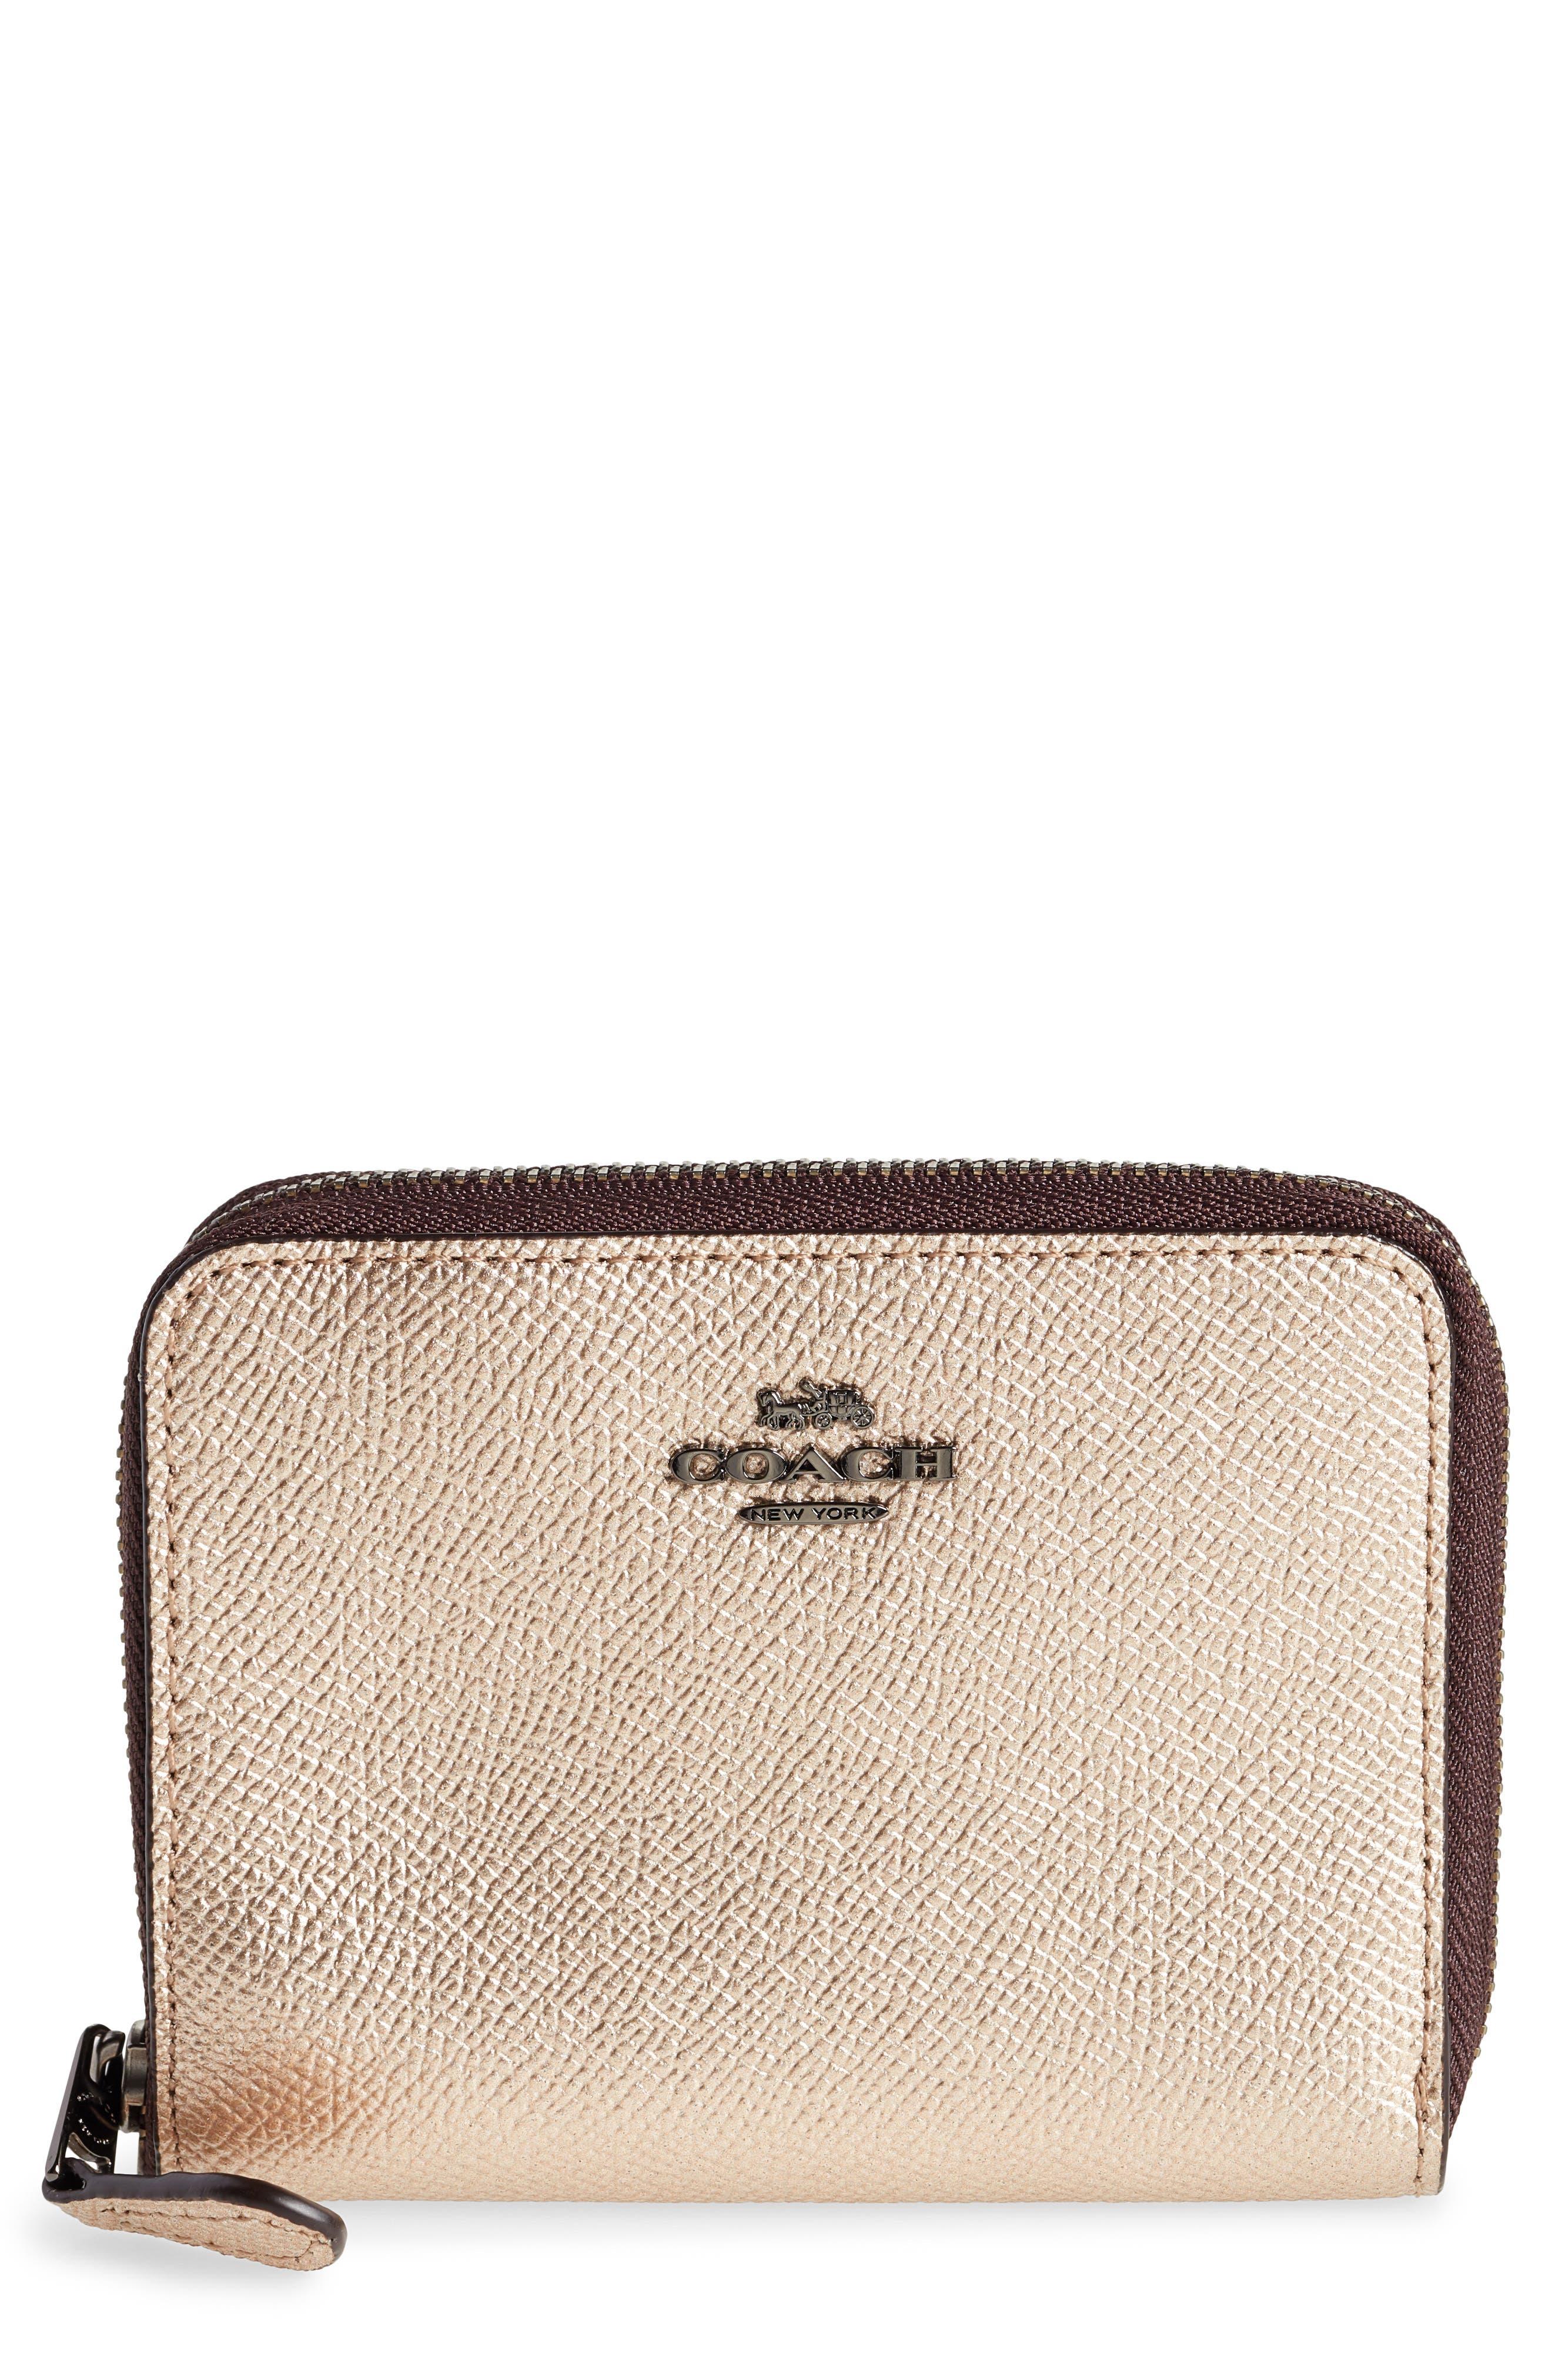 COACH Small Metallic Leather Zip Around Wallet, Main, color, PLATINUM